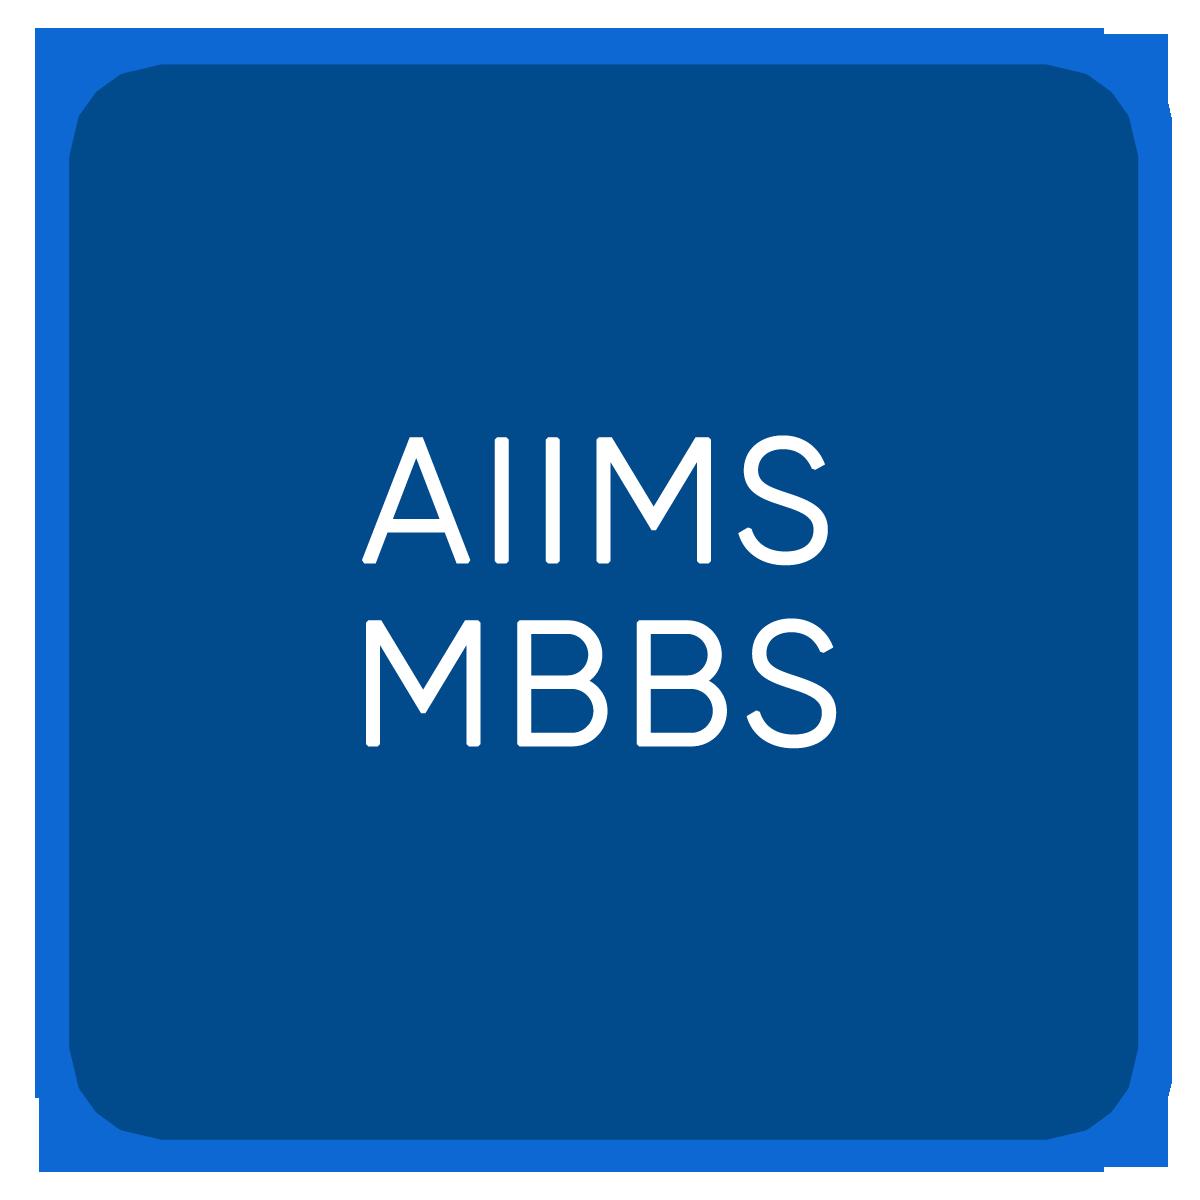 AIIMS MBBS FINAL